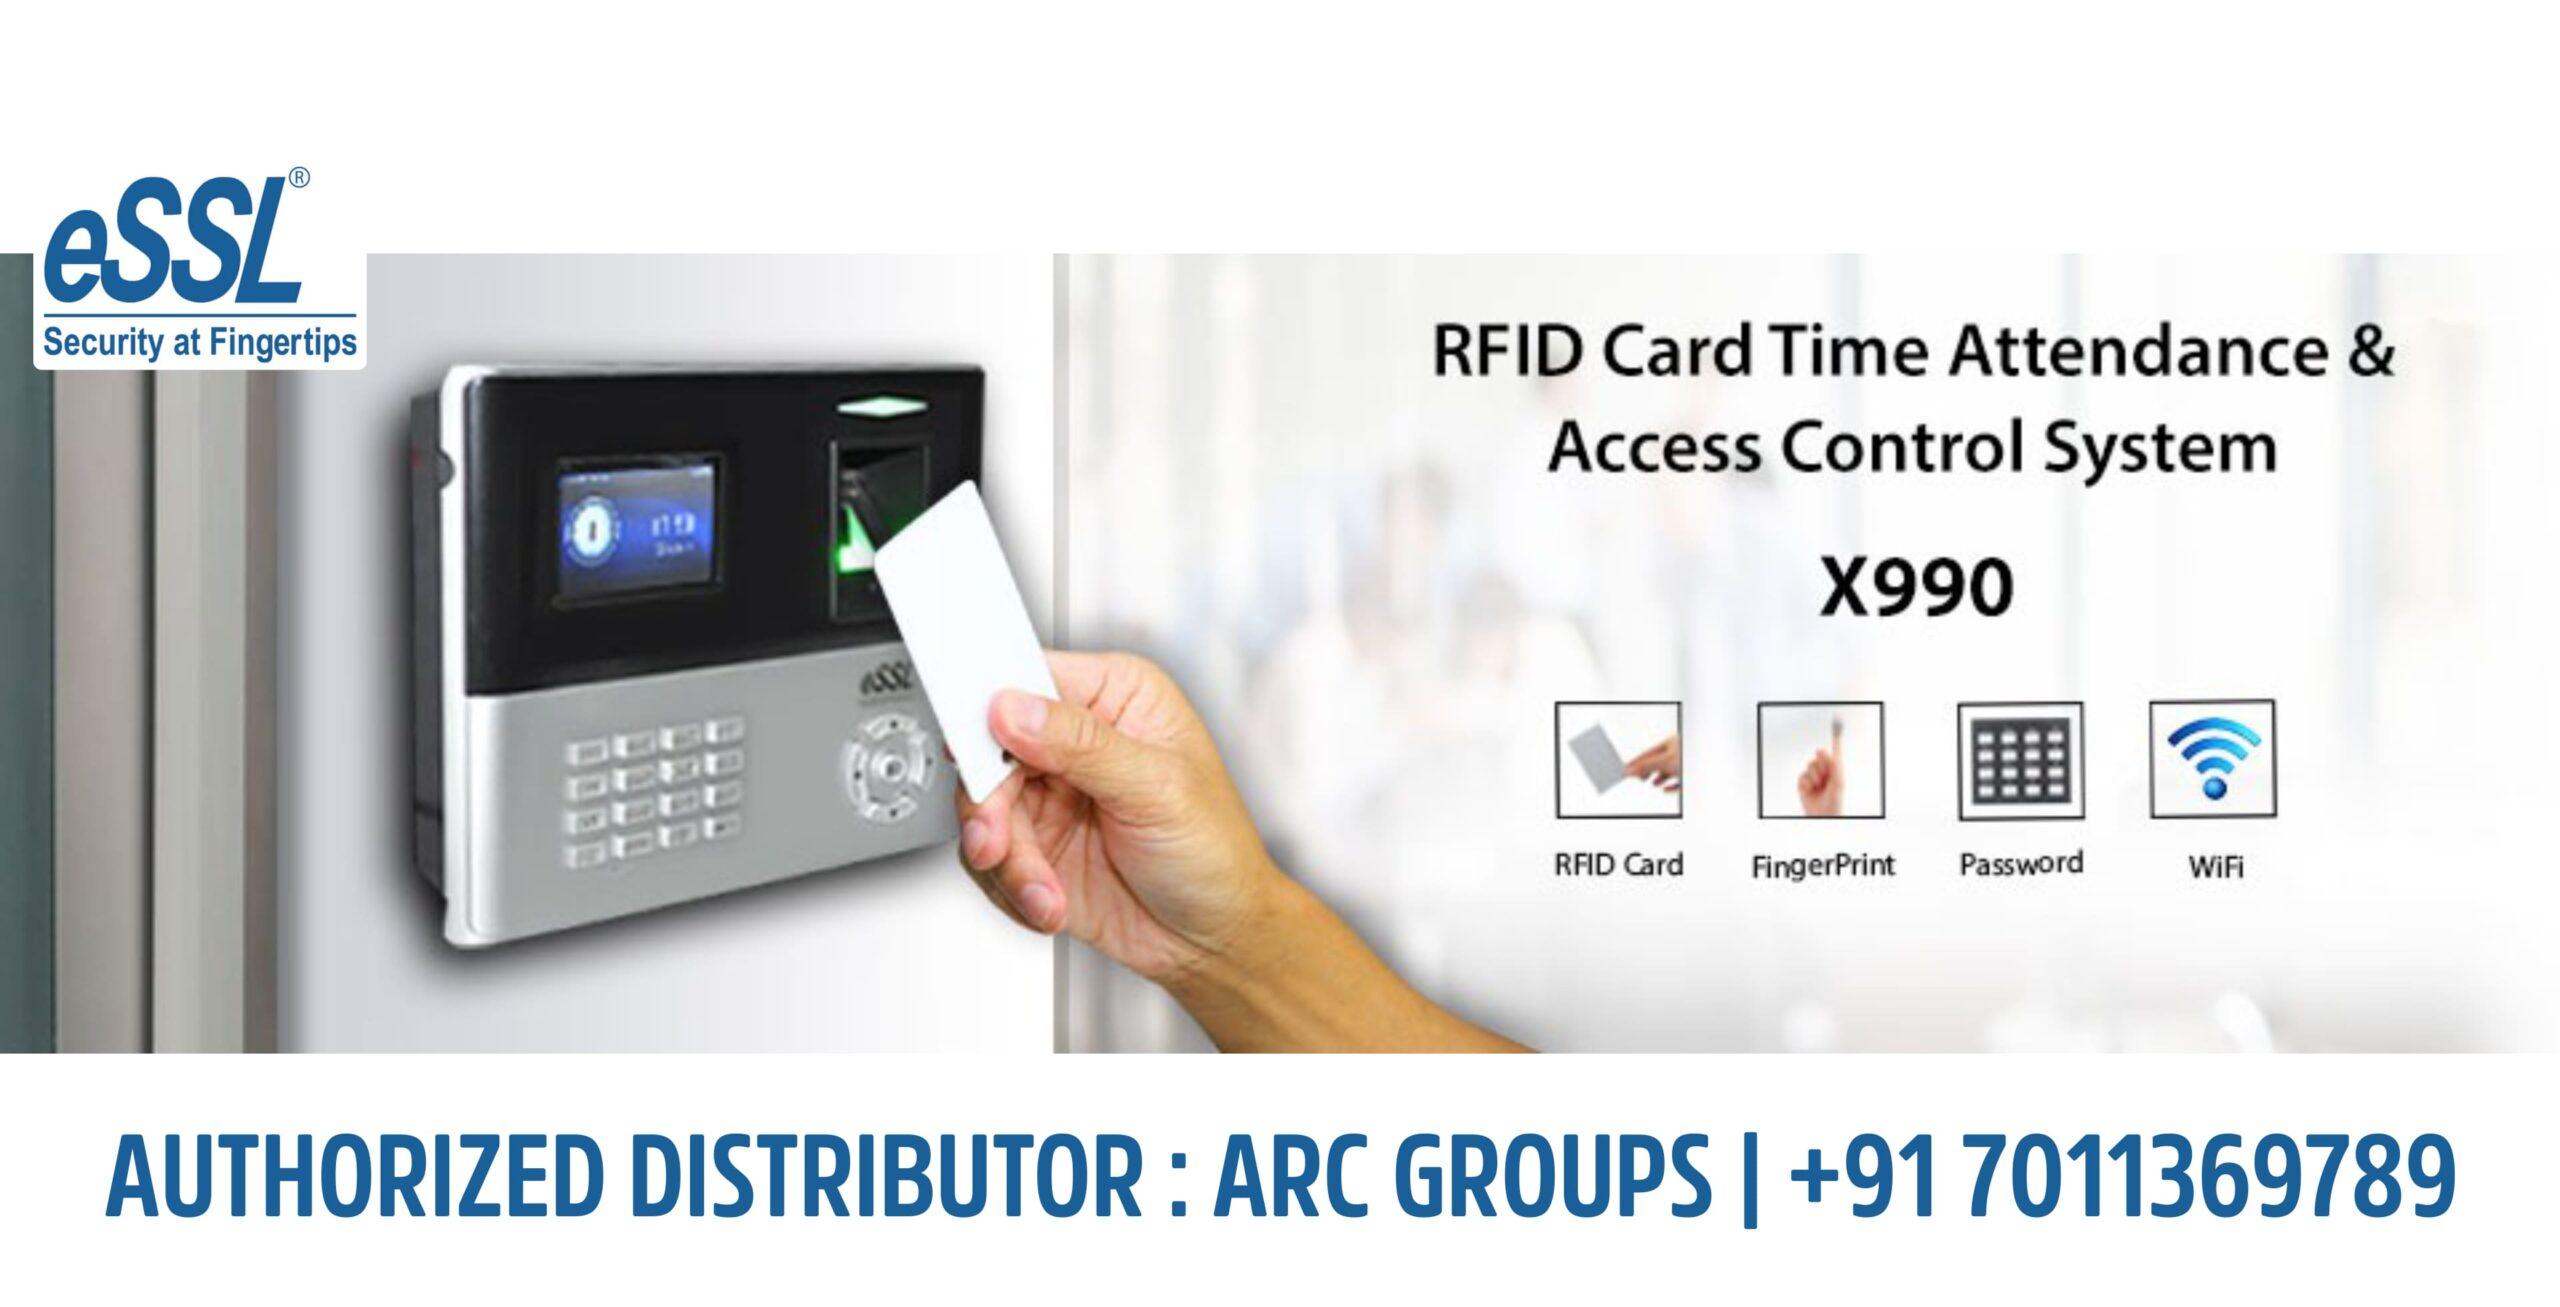 eSSL X990 RFID Card Time Attendance System